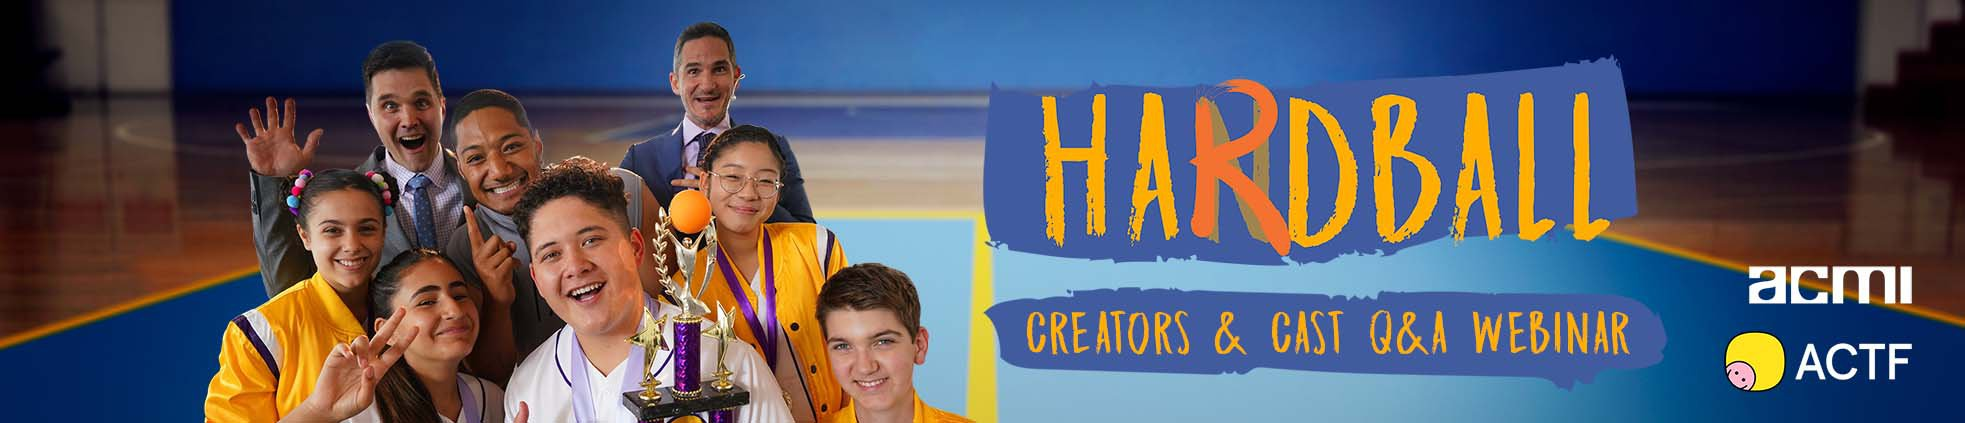 hardballcreatorscastqawebinar1965x423pxlogo.jpeg